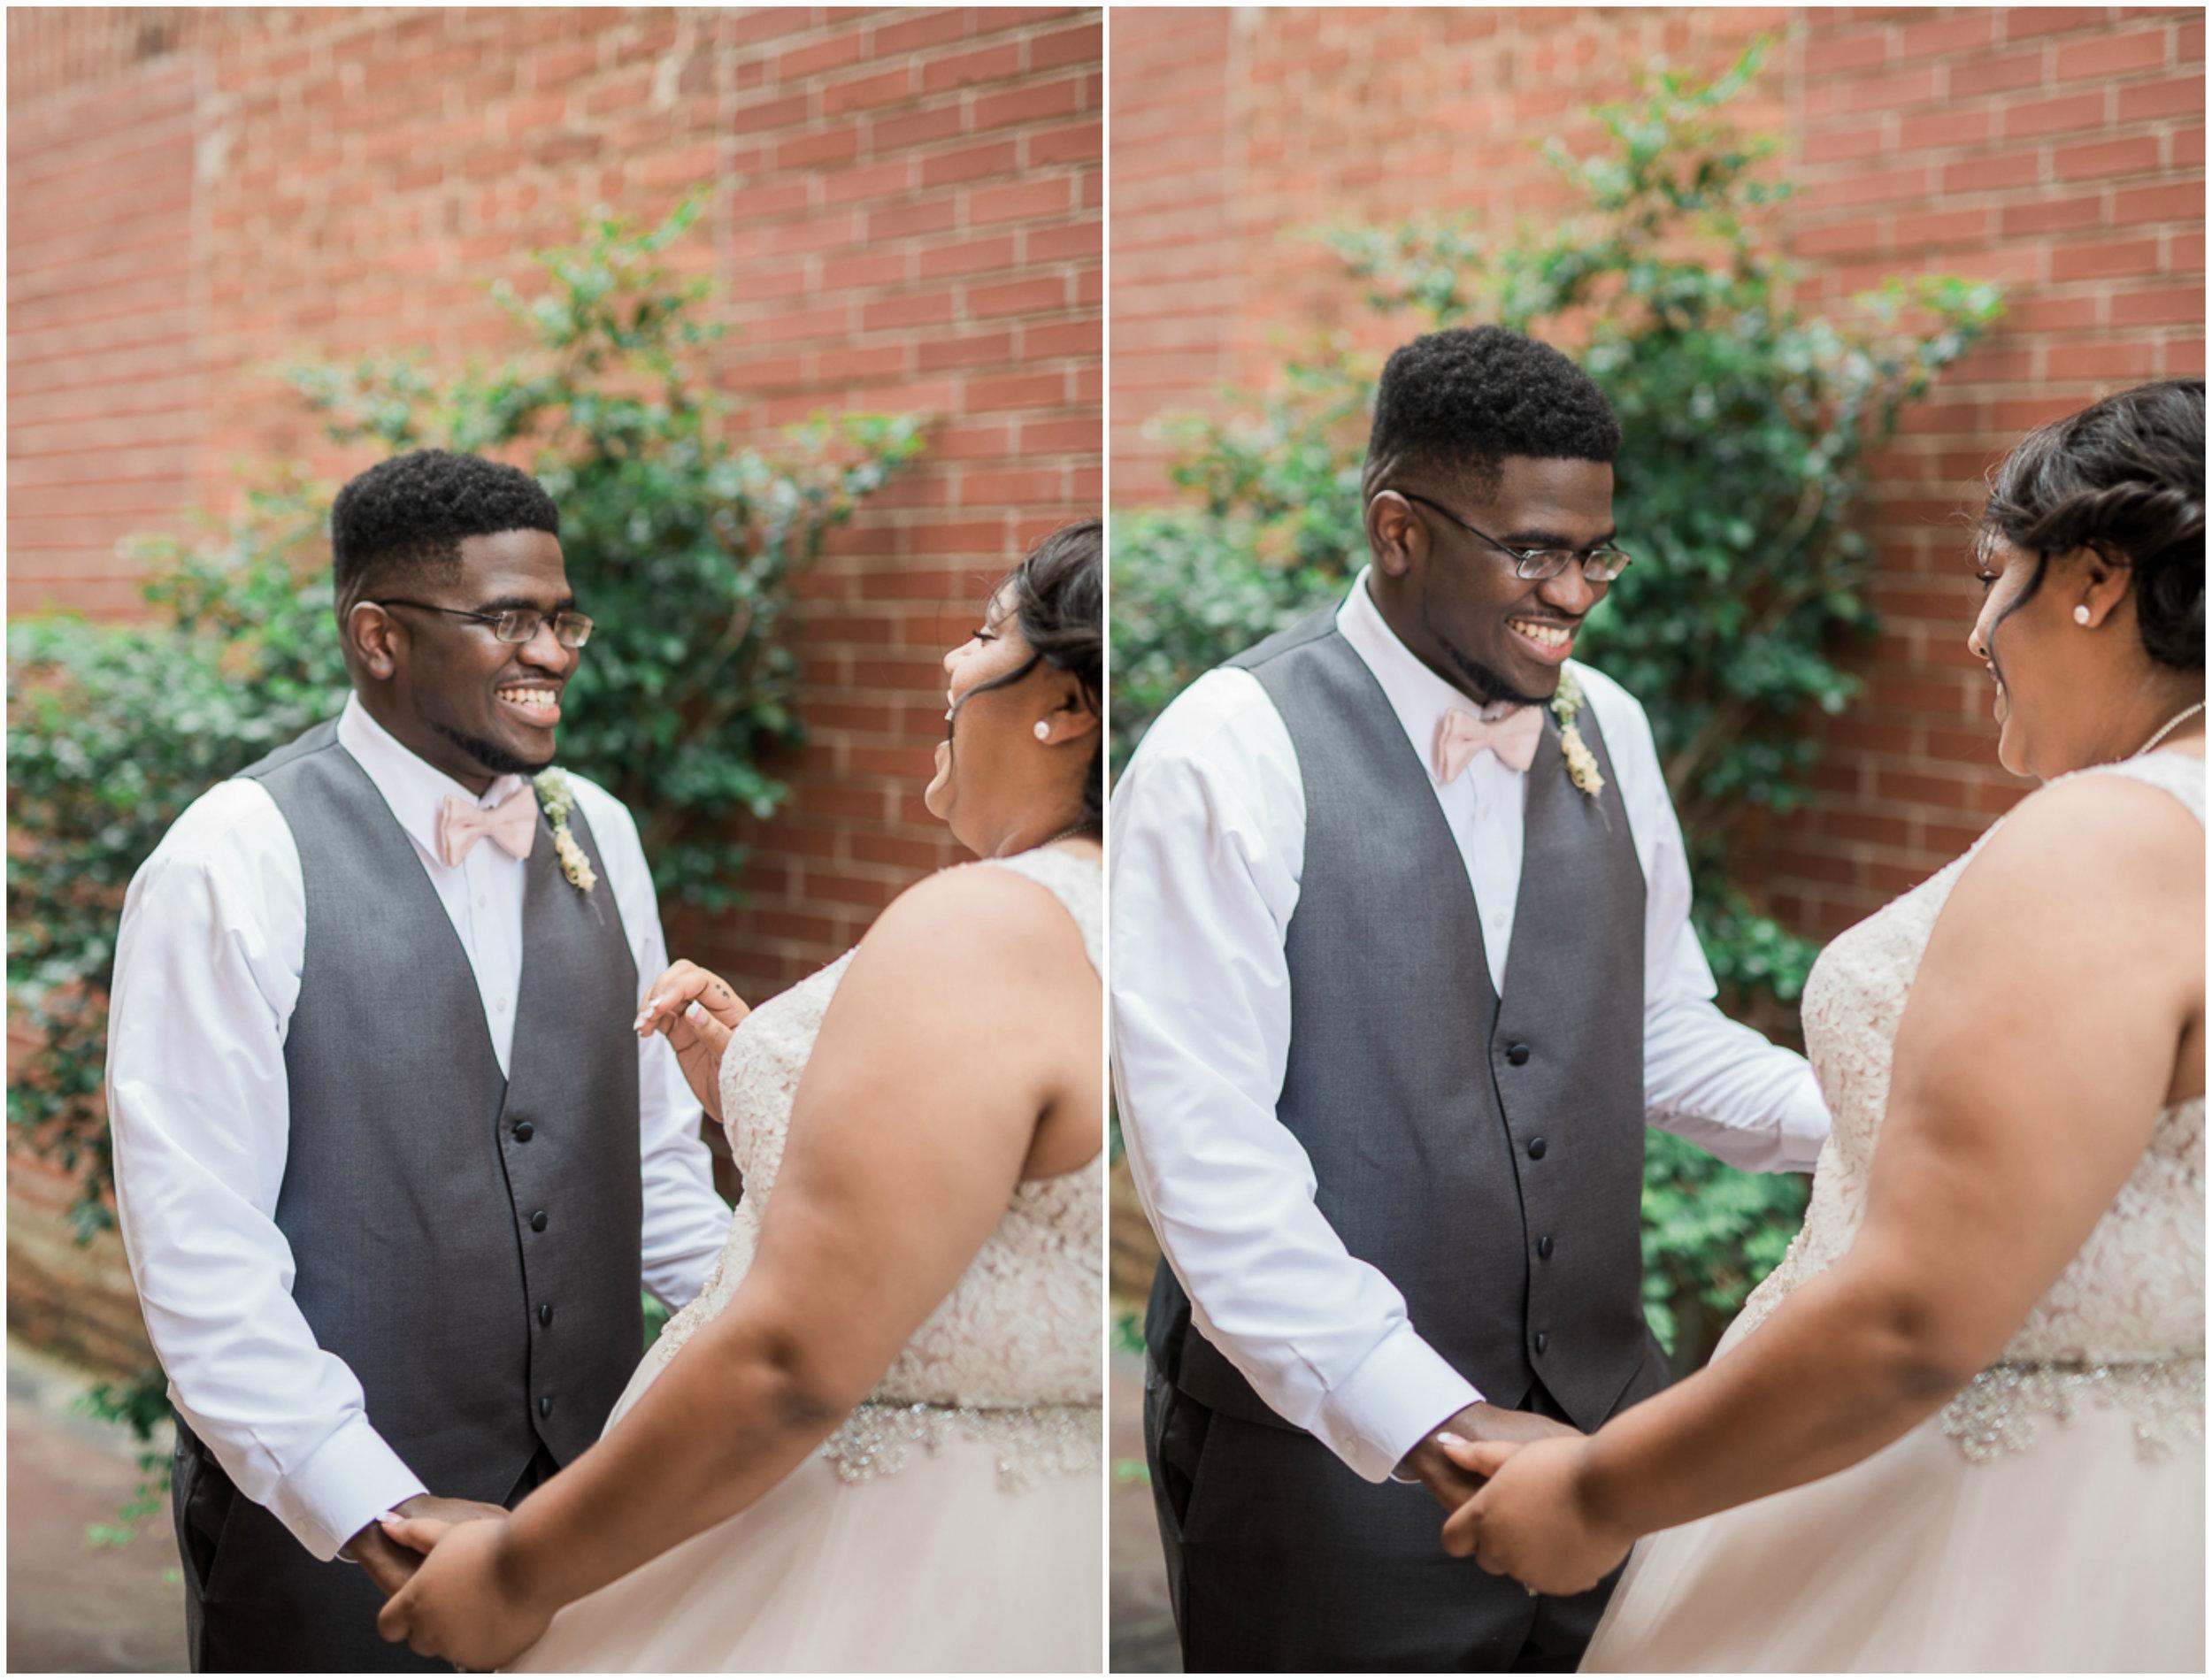 Wedding, First Look 0003.jpg